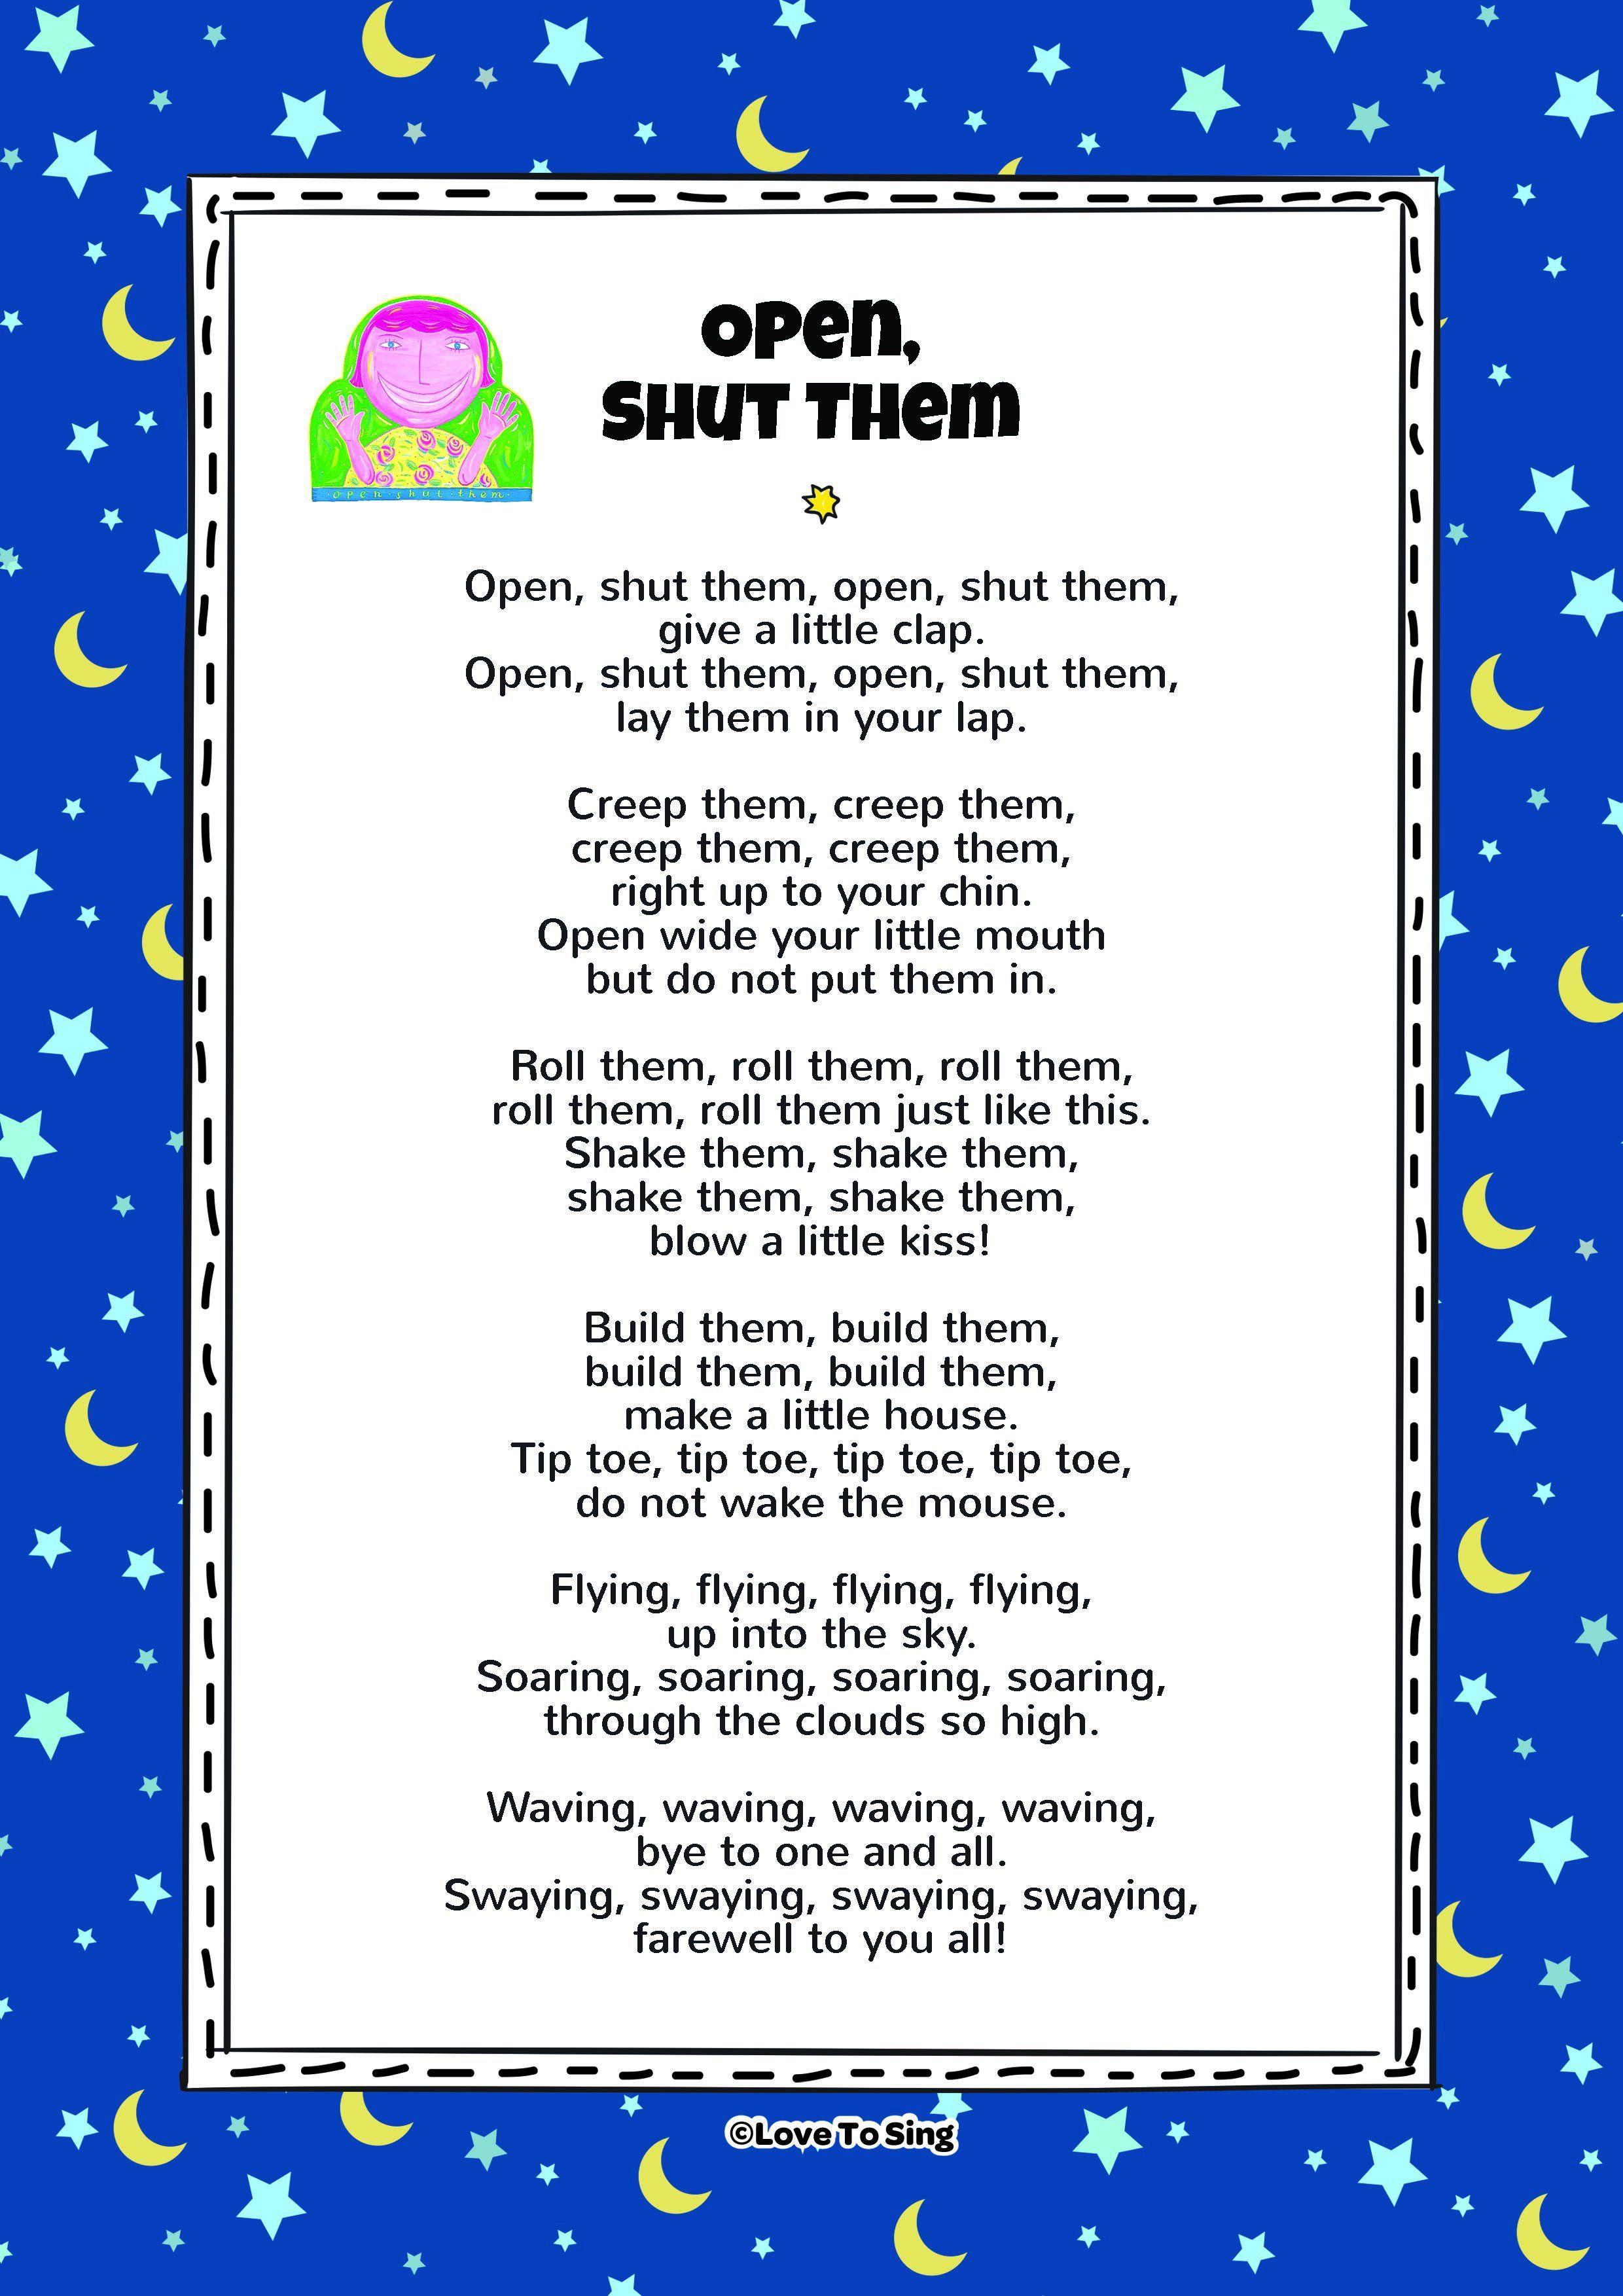 Open Shut Them Kids Video Song With Free Lyrics Activities